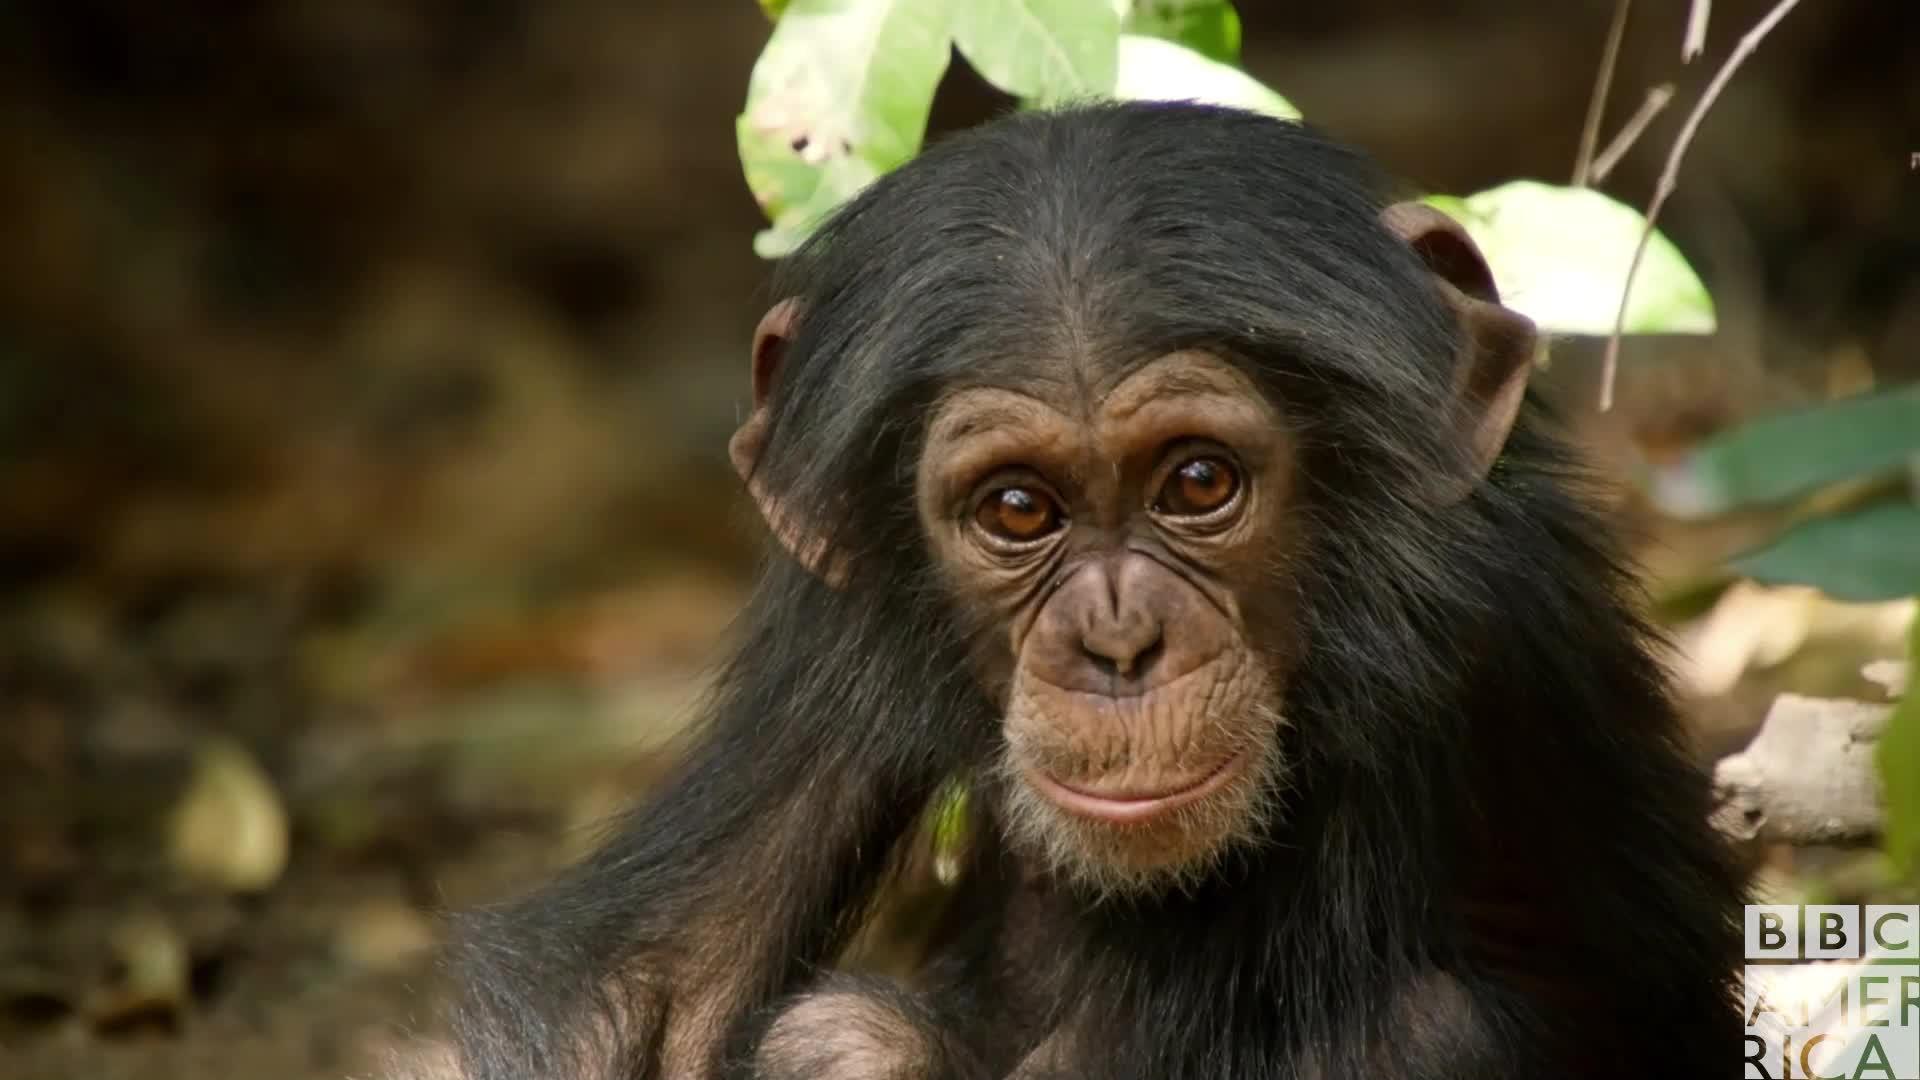 animal, animals, bbc america, bbc america dynasties, bbc america: dynasties, chimp, chimpanzee, chimpanzees, chimps, dynasties, Dynasties Sad Chimp Eyes GIFs